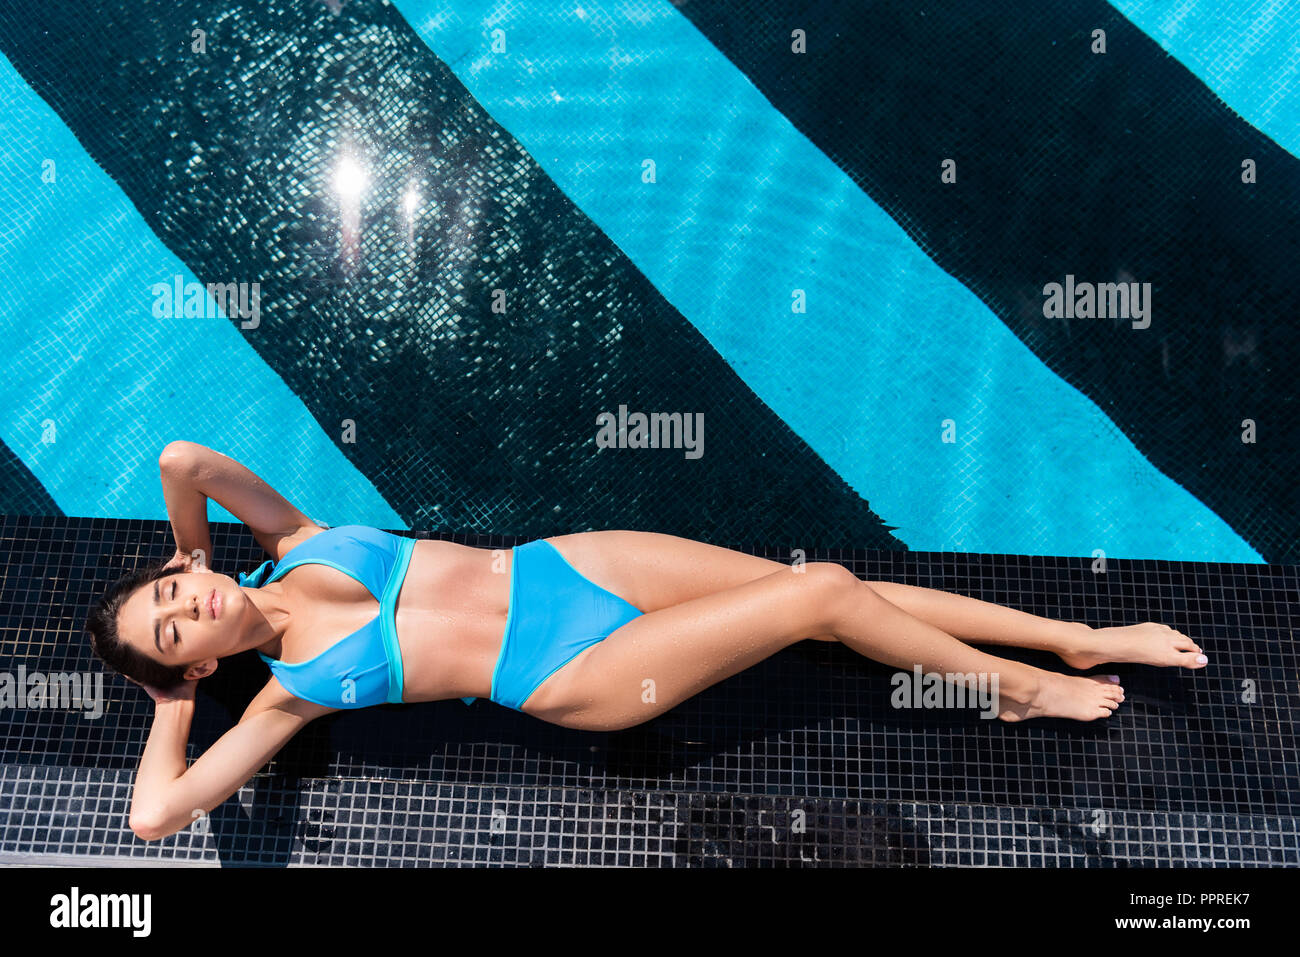 top view of girl in blue bikini sunbathing at poolside - Stock Image